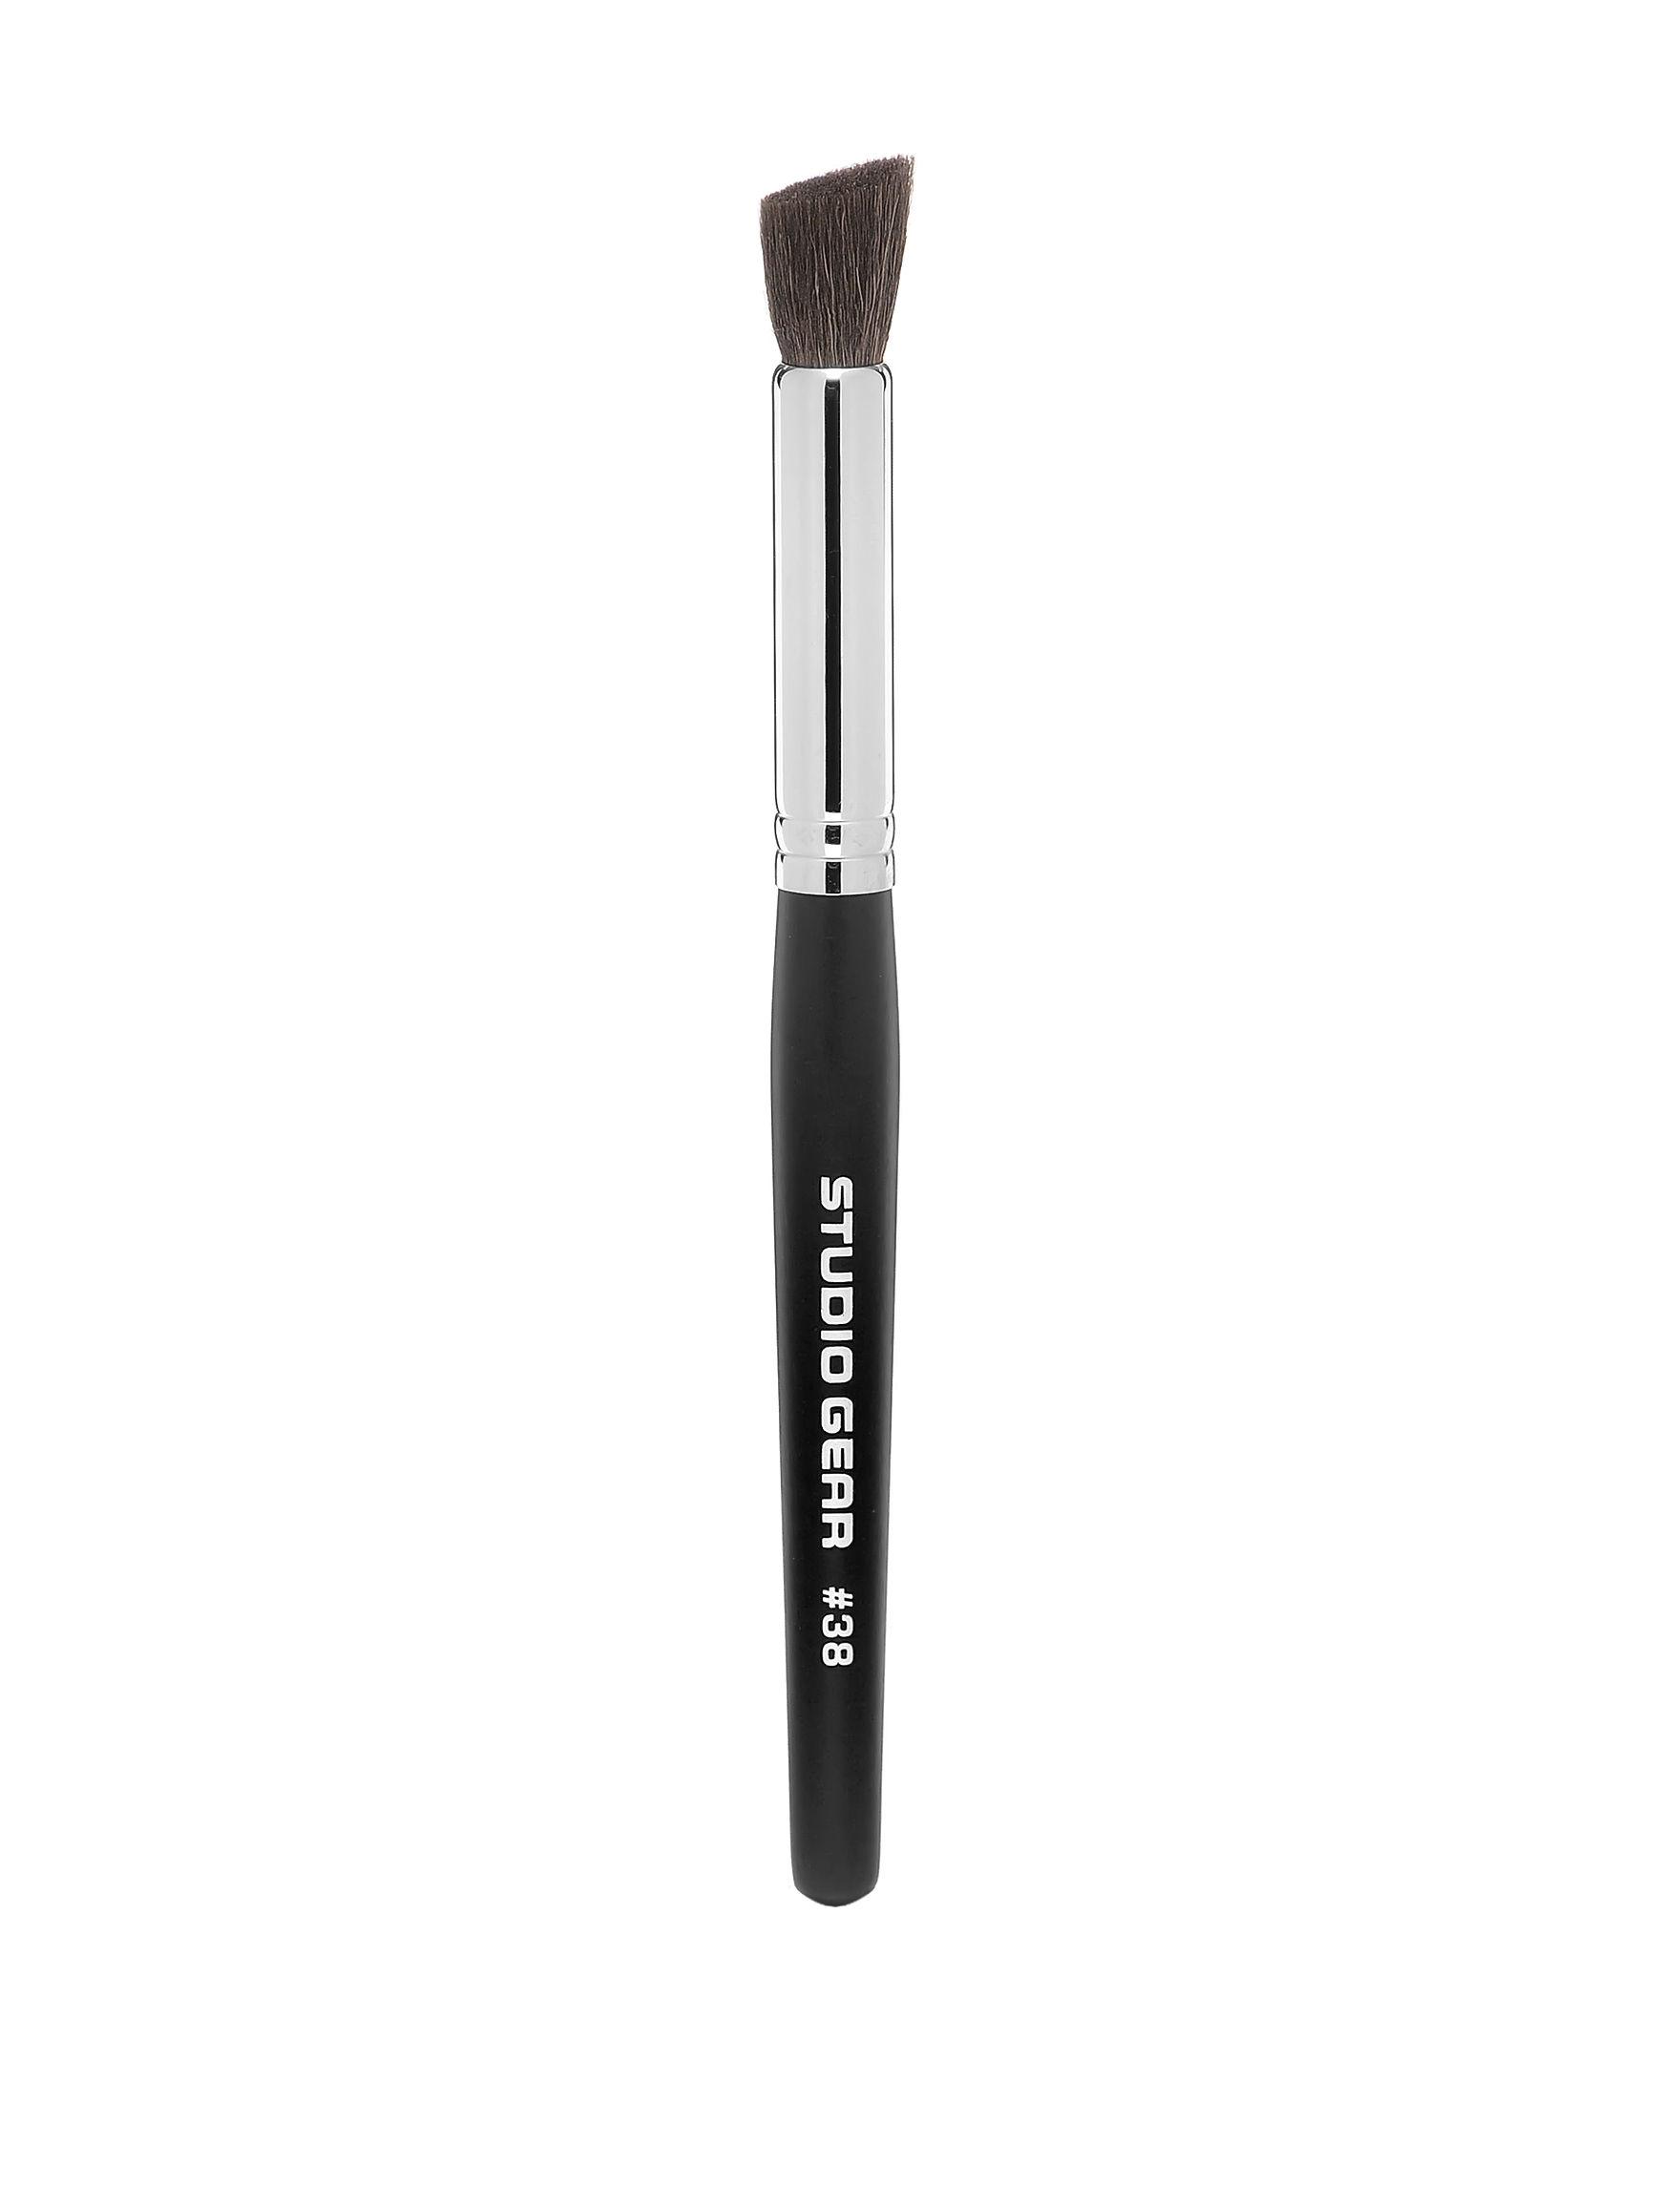 Studio Gear  Tools & Brushes Brow